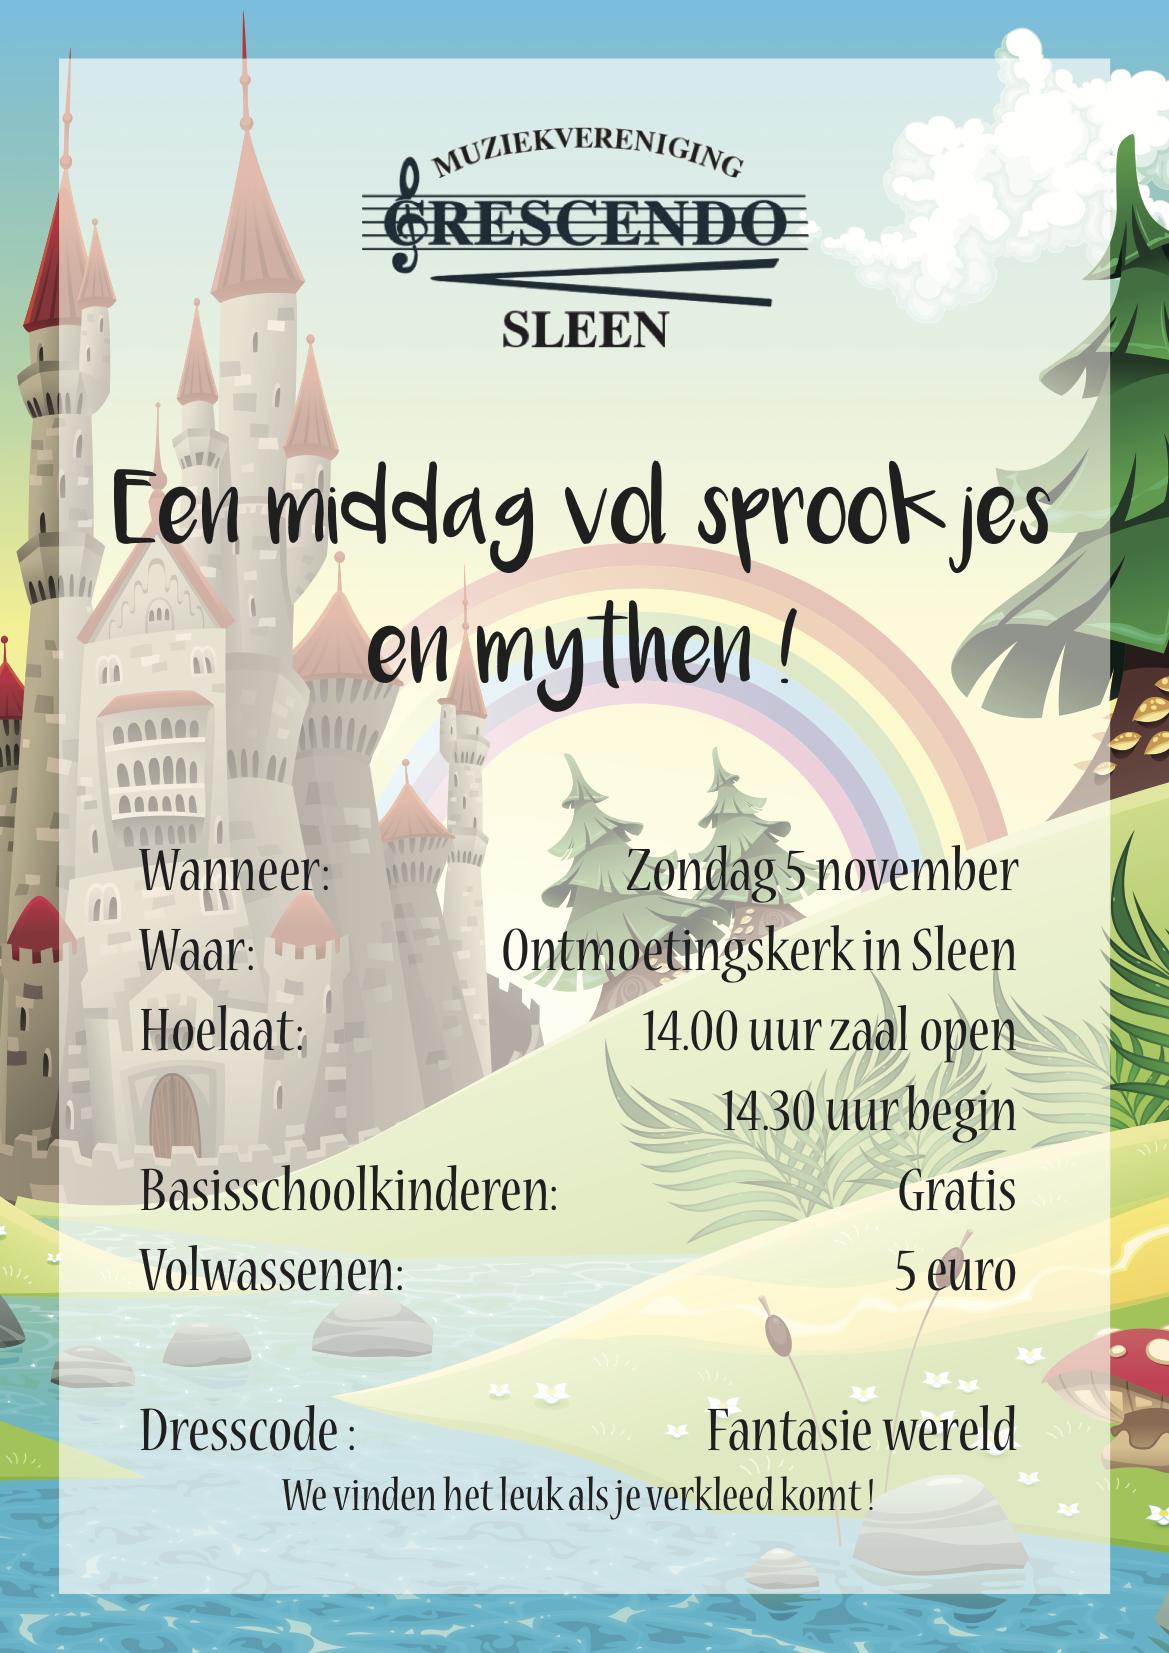 Poster Cresendo sprookjes mythen